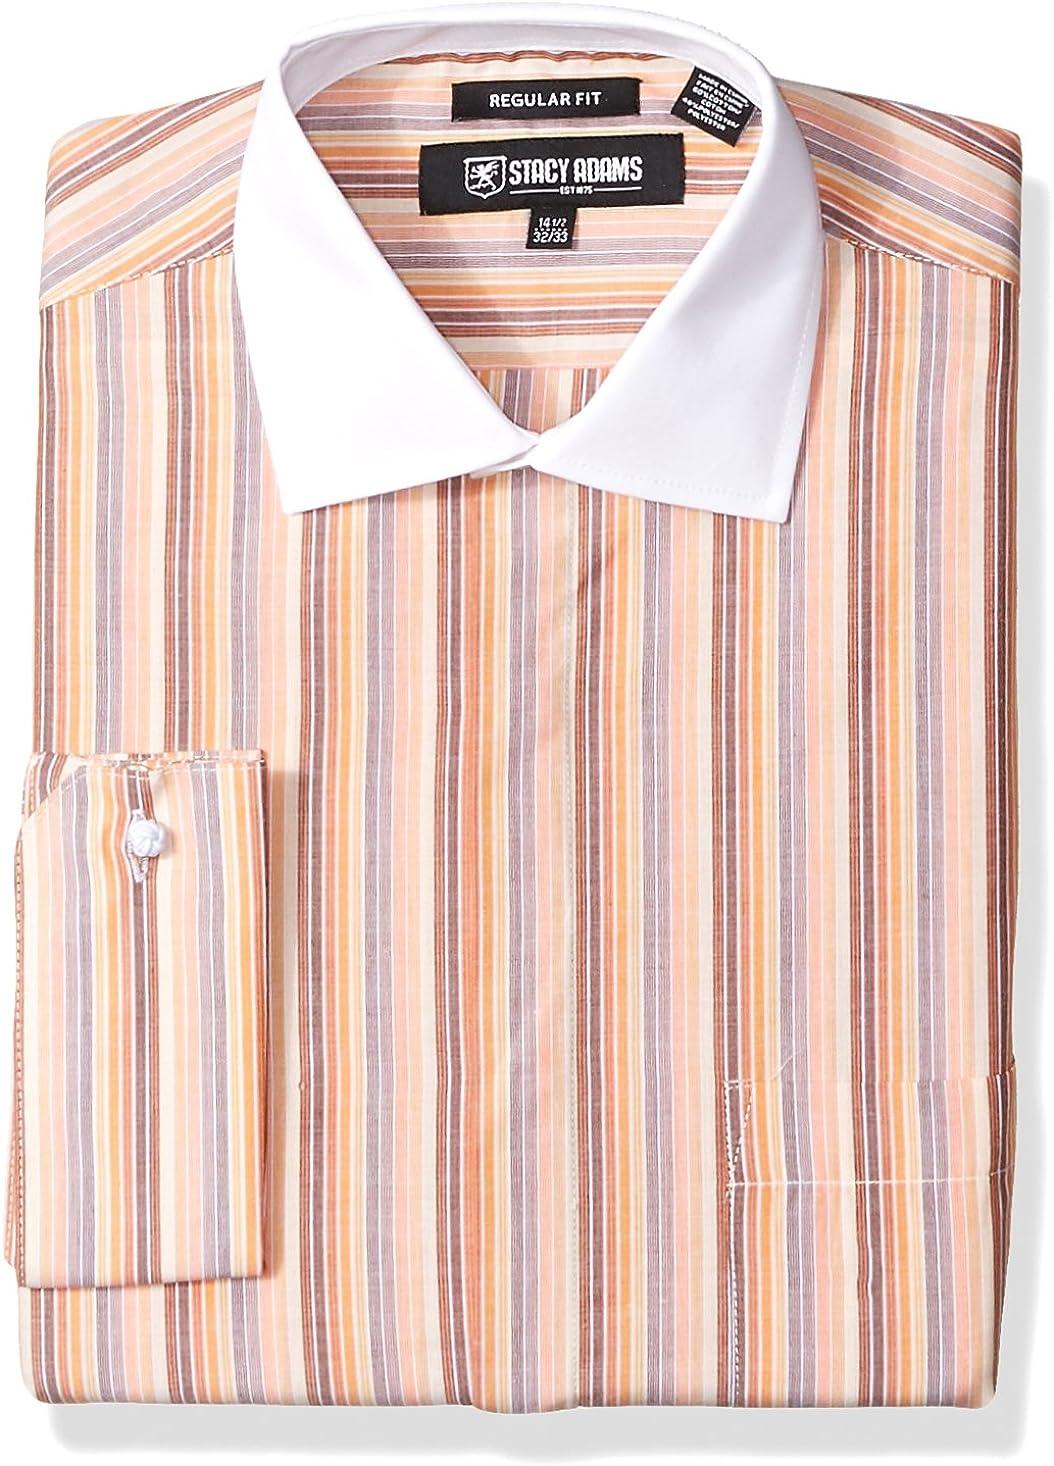 STACY ADAMS Men's Mulit Stripe Classic Fit Dress Shirt